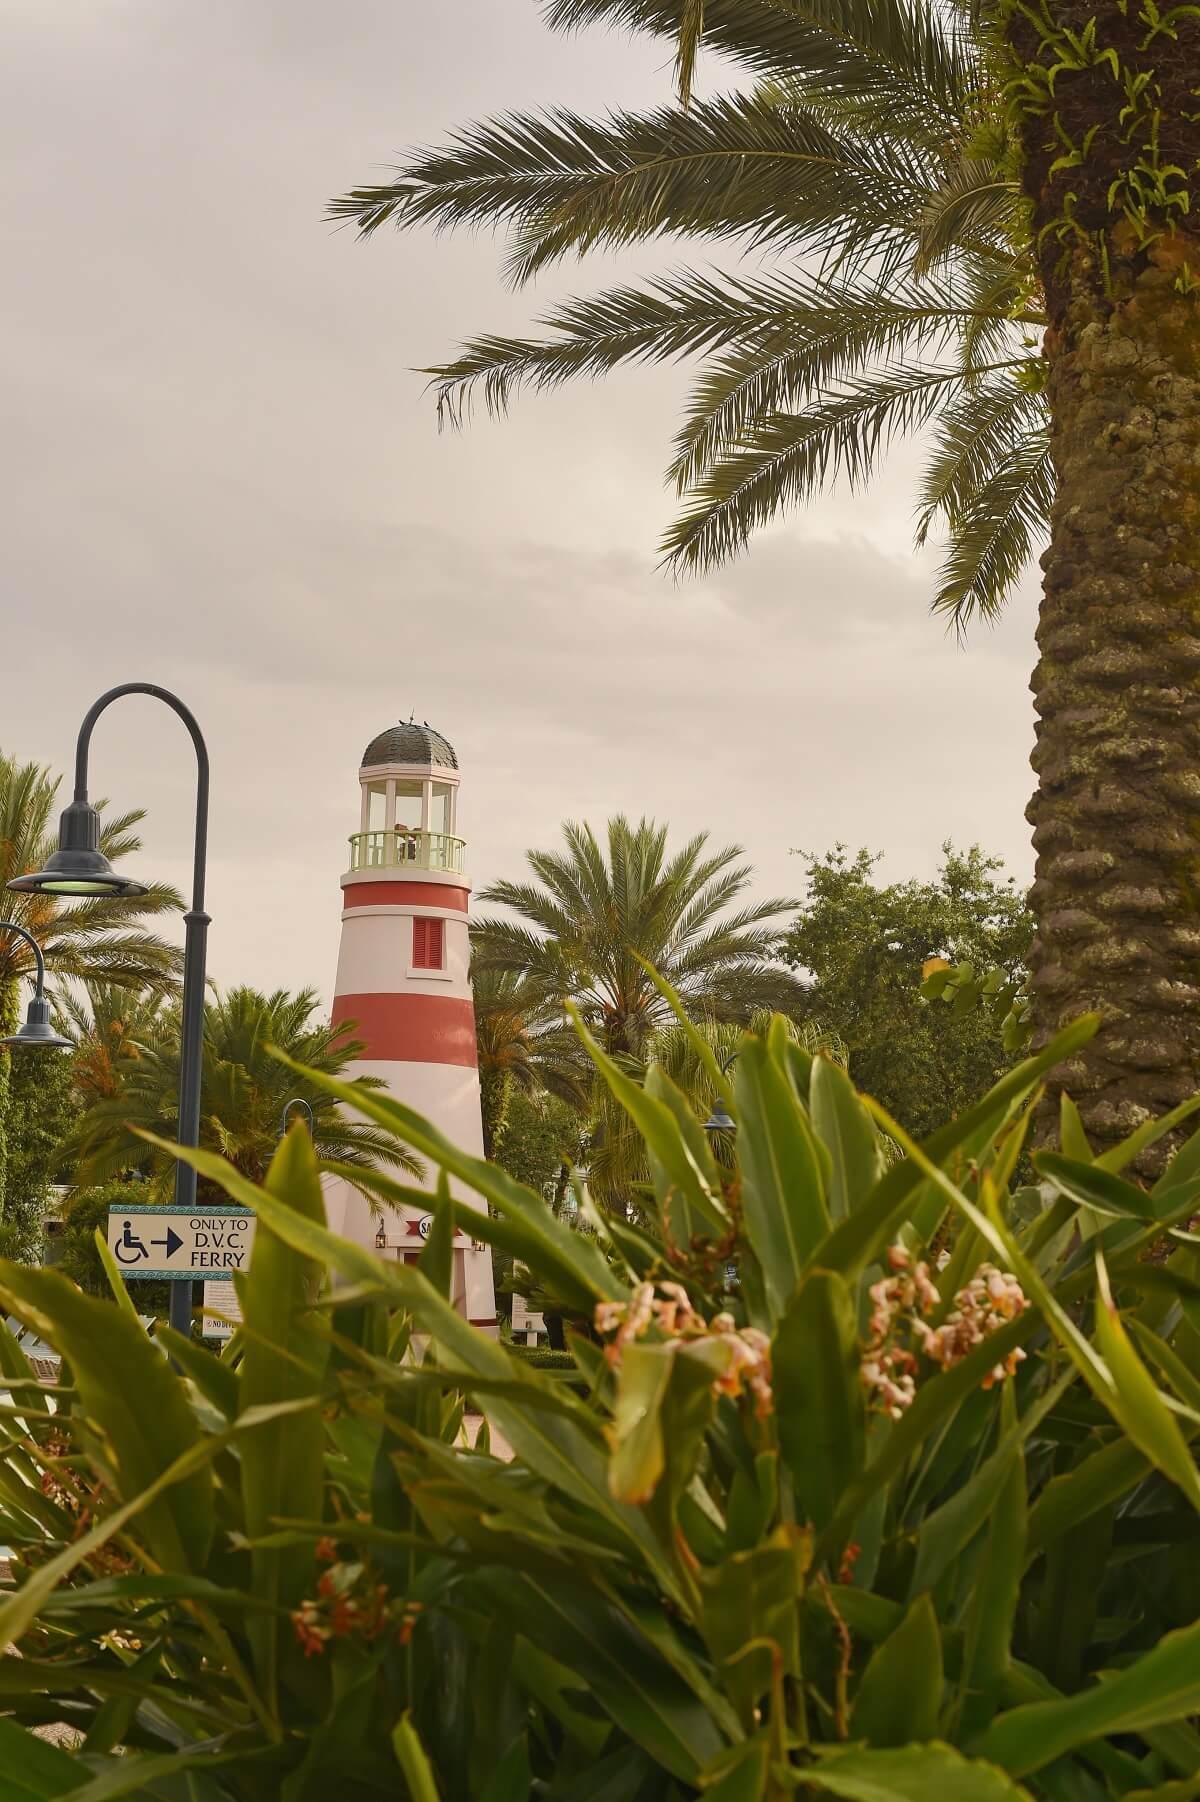 Guide To Disney S Old Key West Resort Dvc Resale Market